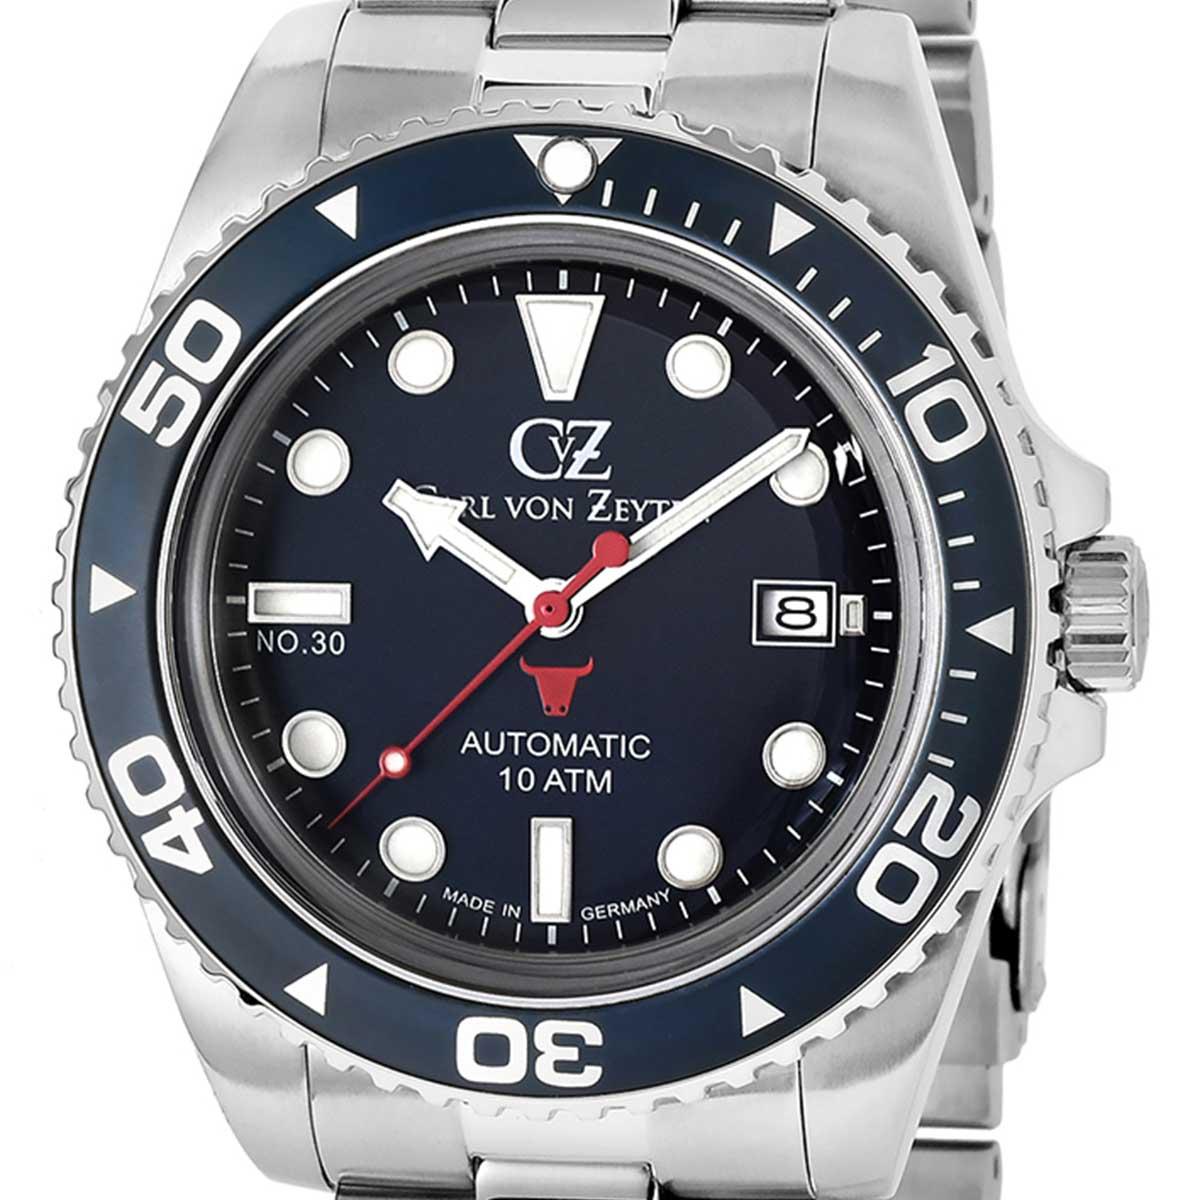 Carl von Zeyten カール・フォン・ツォイテン 自動巻き(手巻き機能あり) 腕時計 [CvZ0030BLMB] 並行輸入品  カレンダー